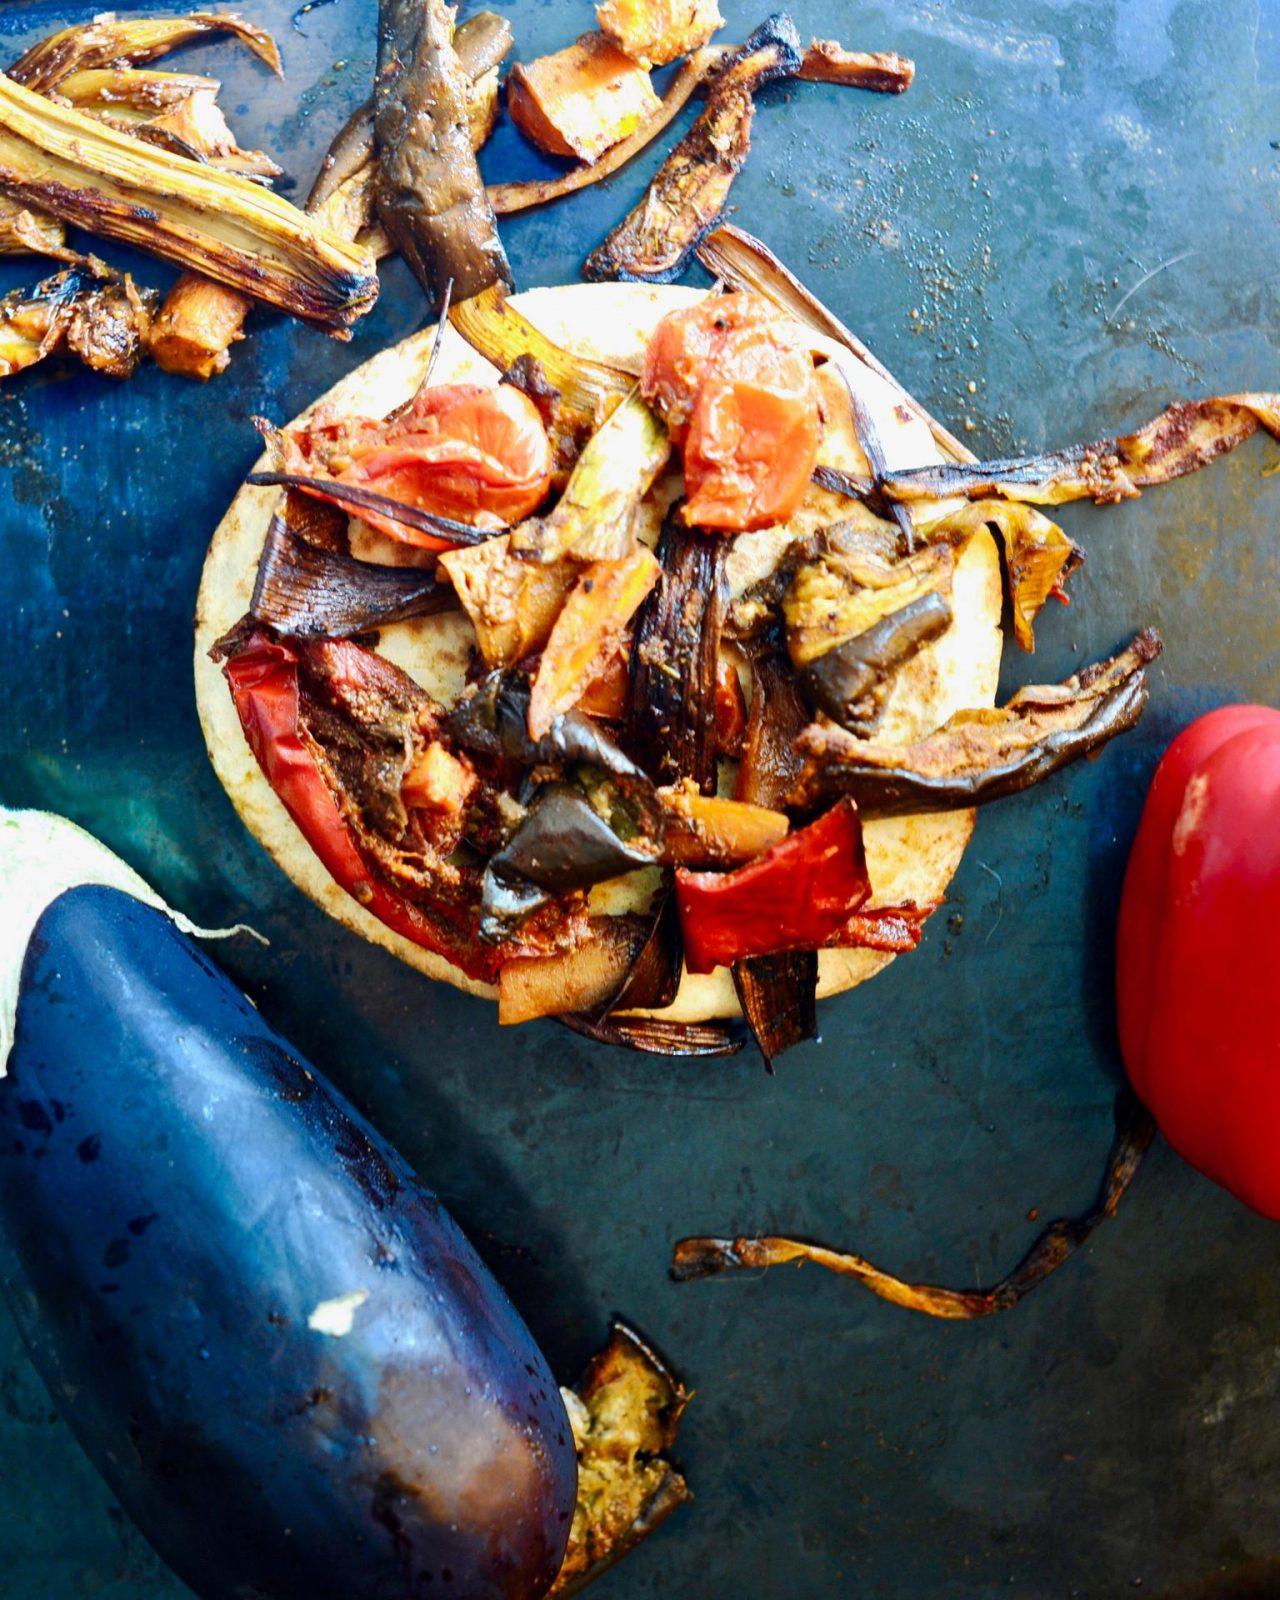 Shawarma Spiced Roasted Eggplant (Vegan, Gluten Free)